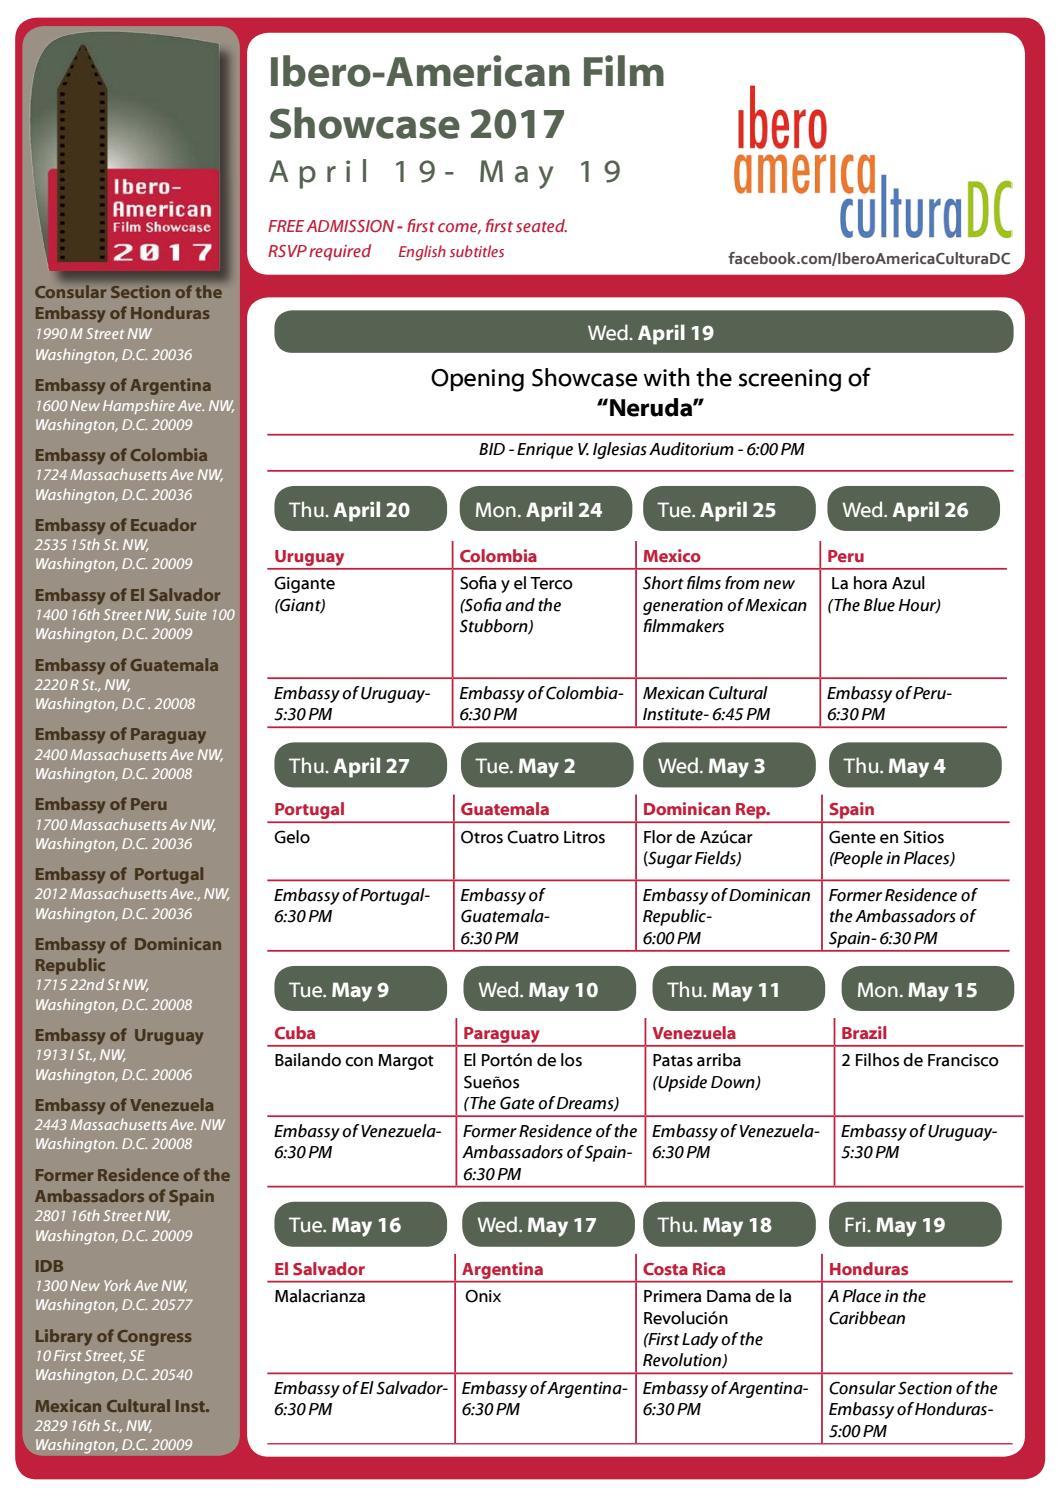 Filmfest 2017 calendar agenda by aacia - issuu